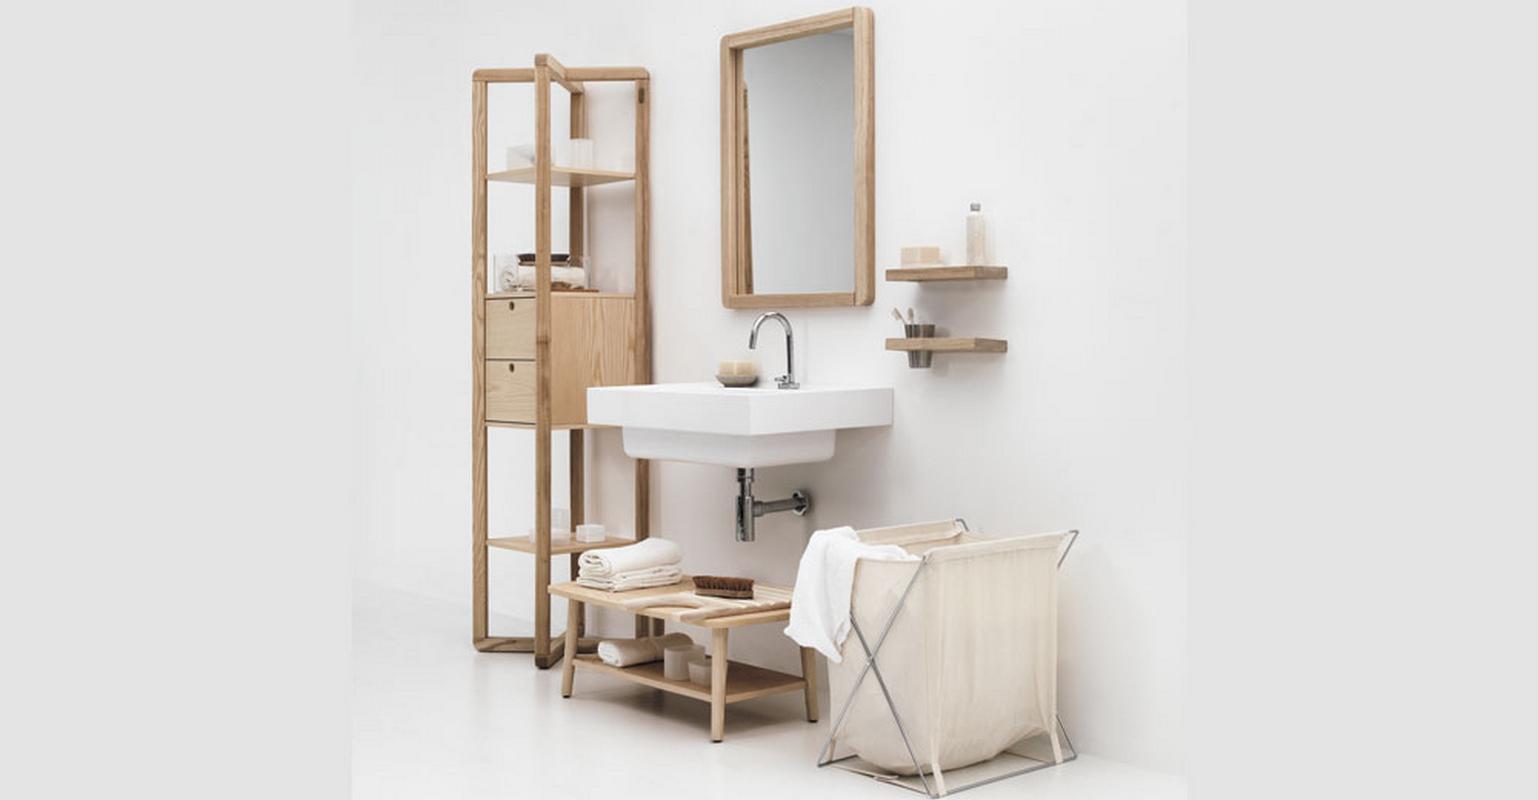 Arredi Lavanderia Bagno : Mobili per lavanderia